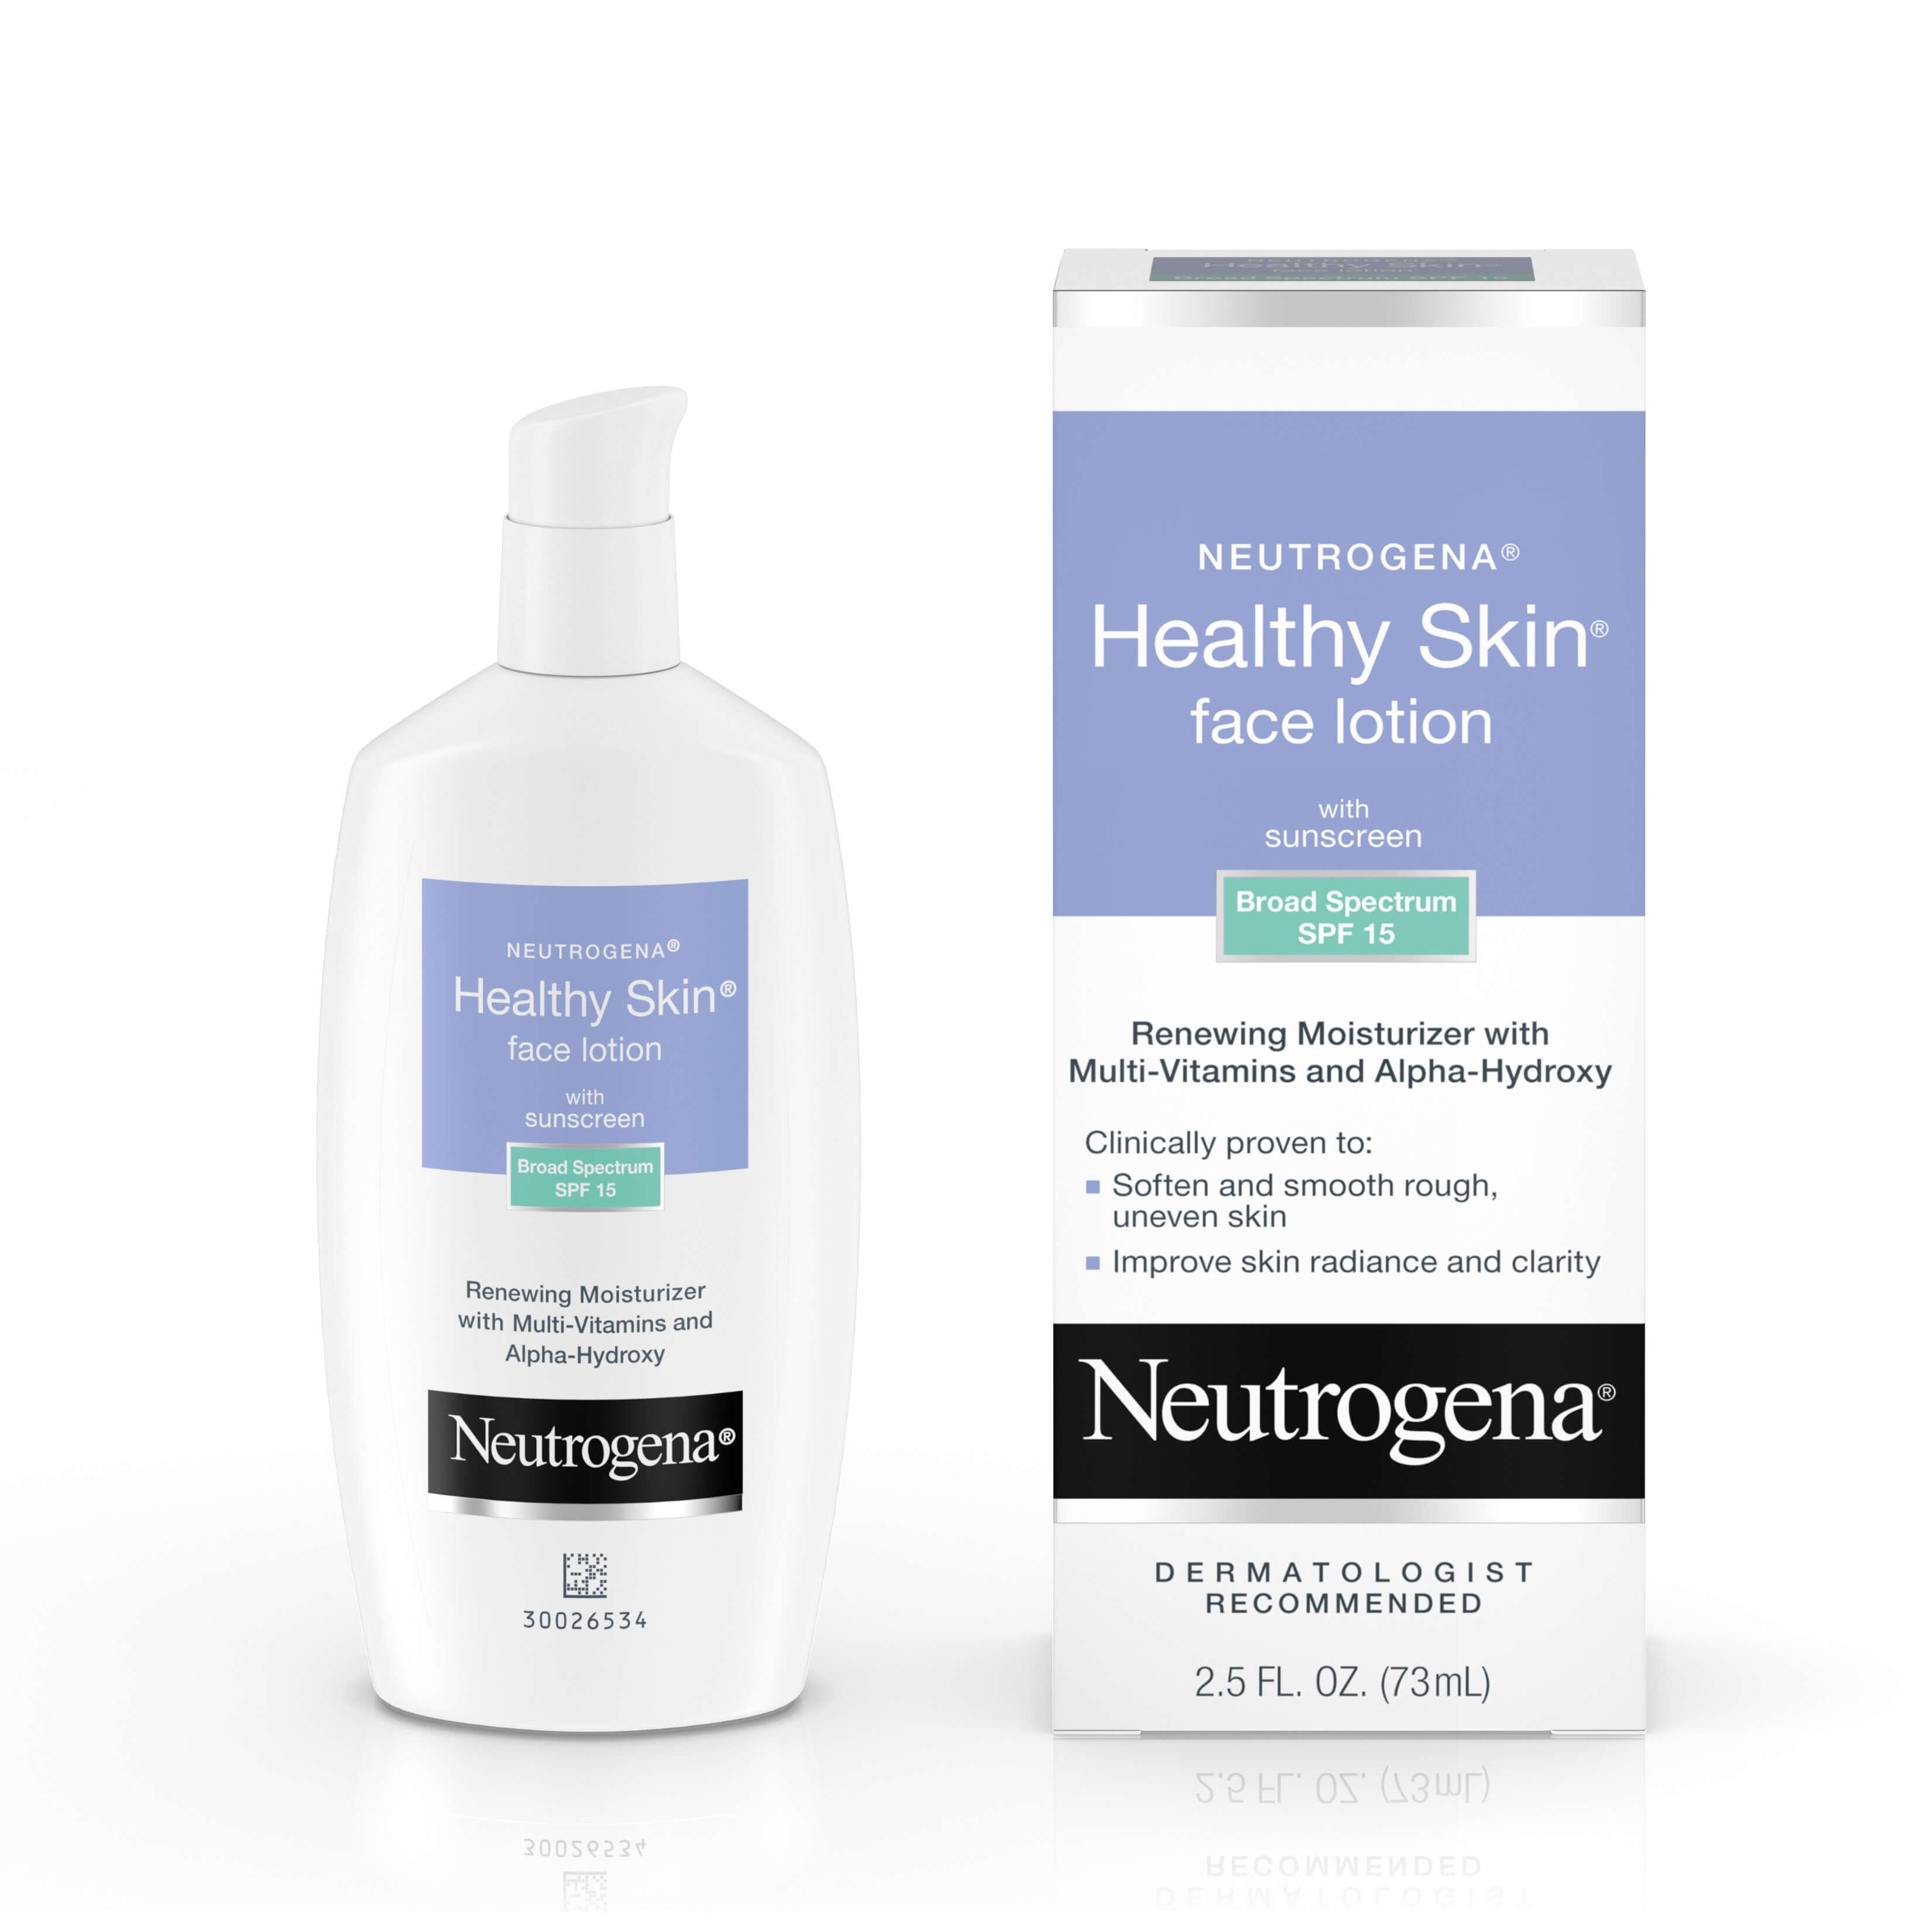 Neutrogena healthy skin face lotion with spf 15 multivitamin facial